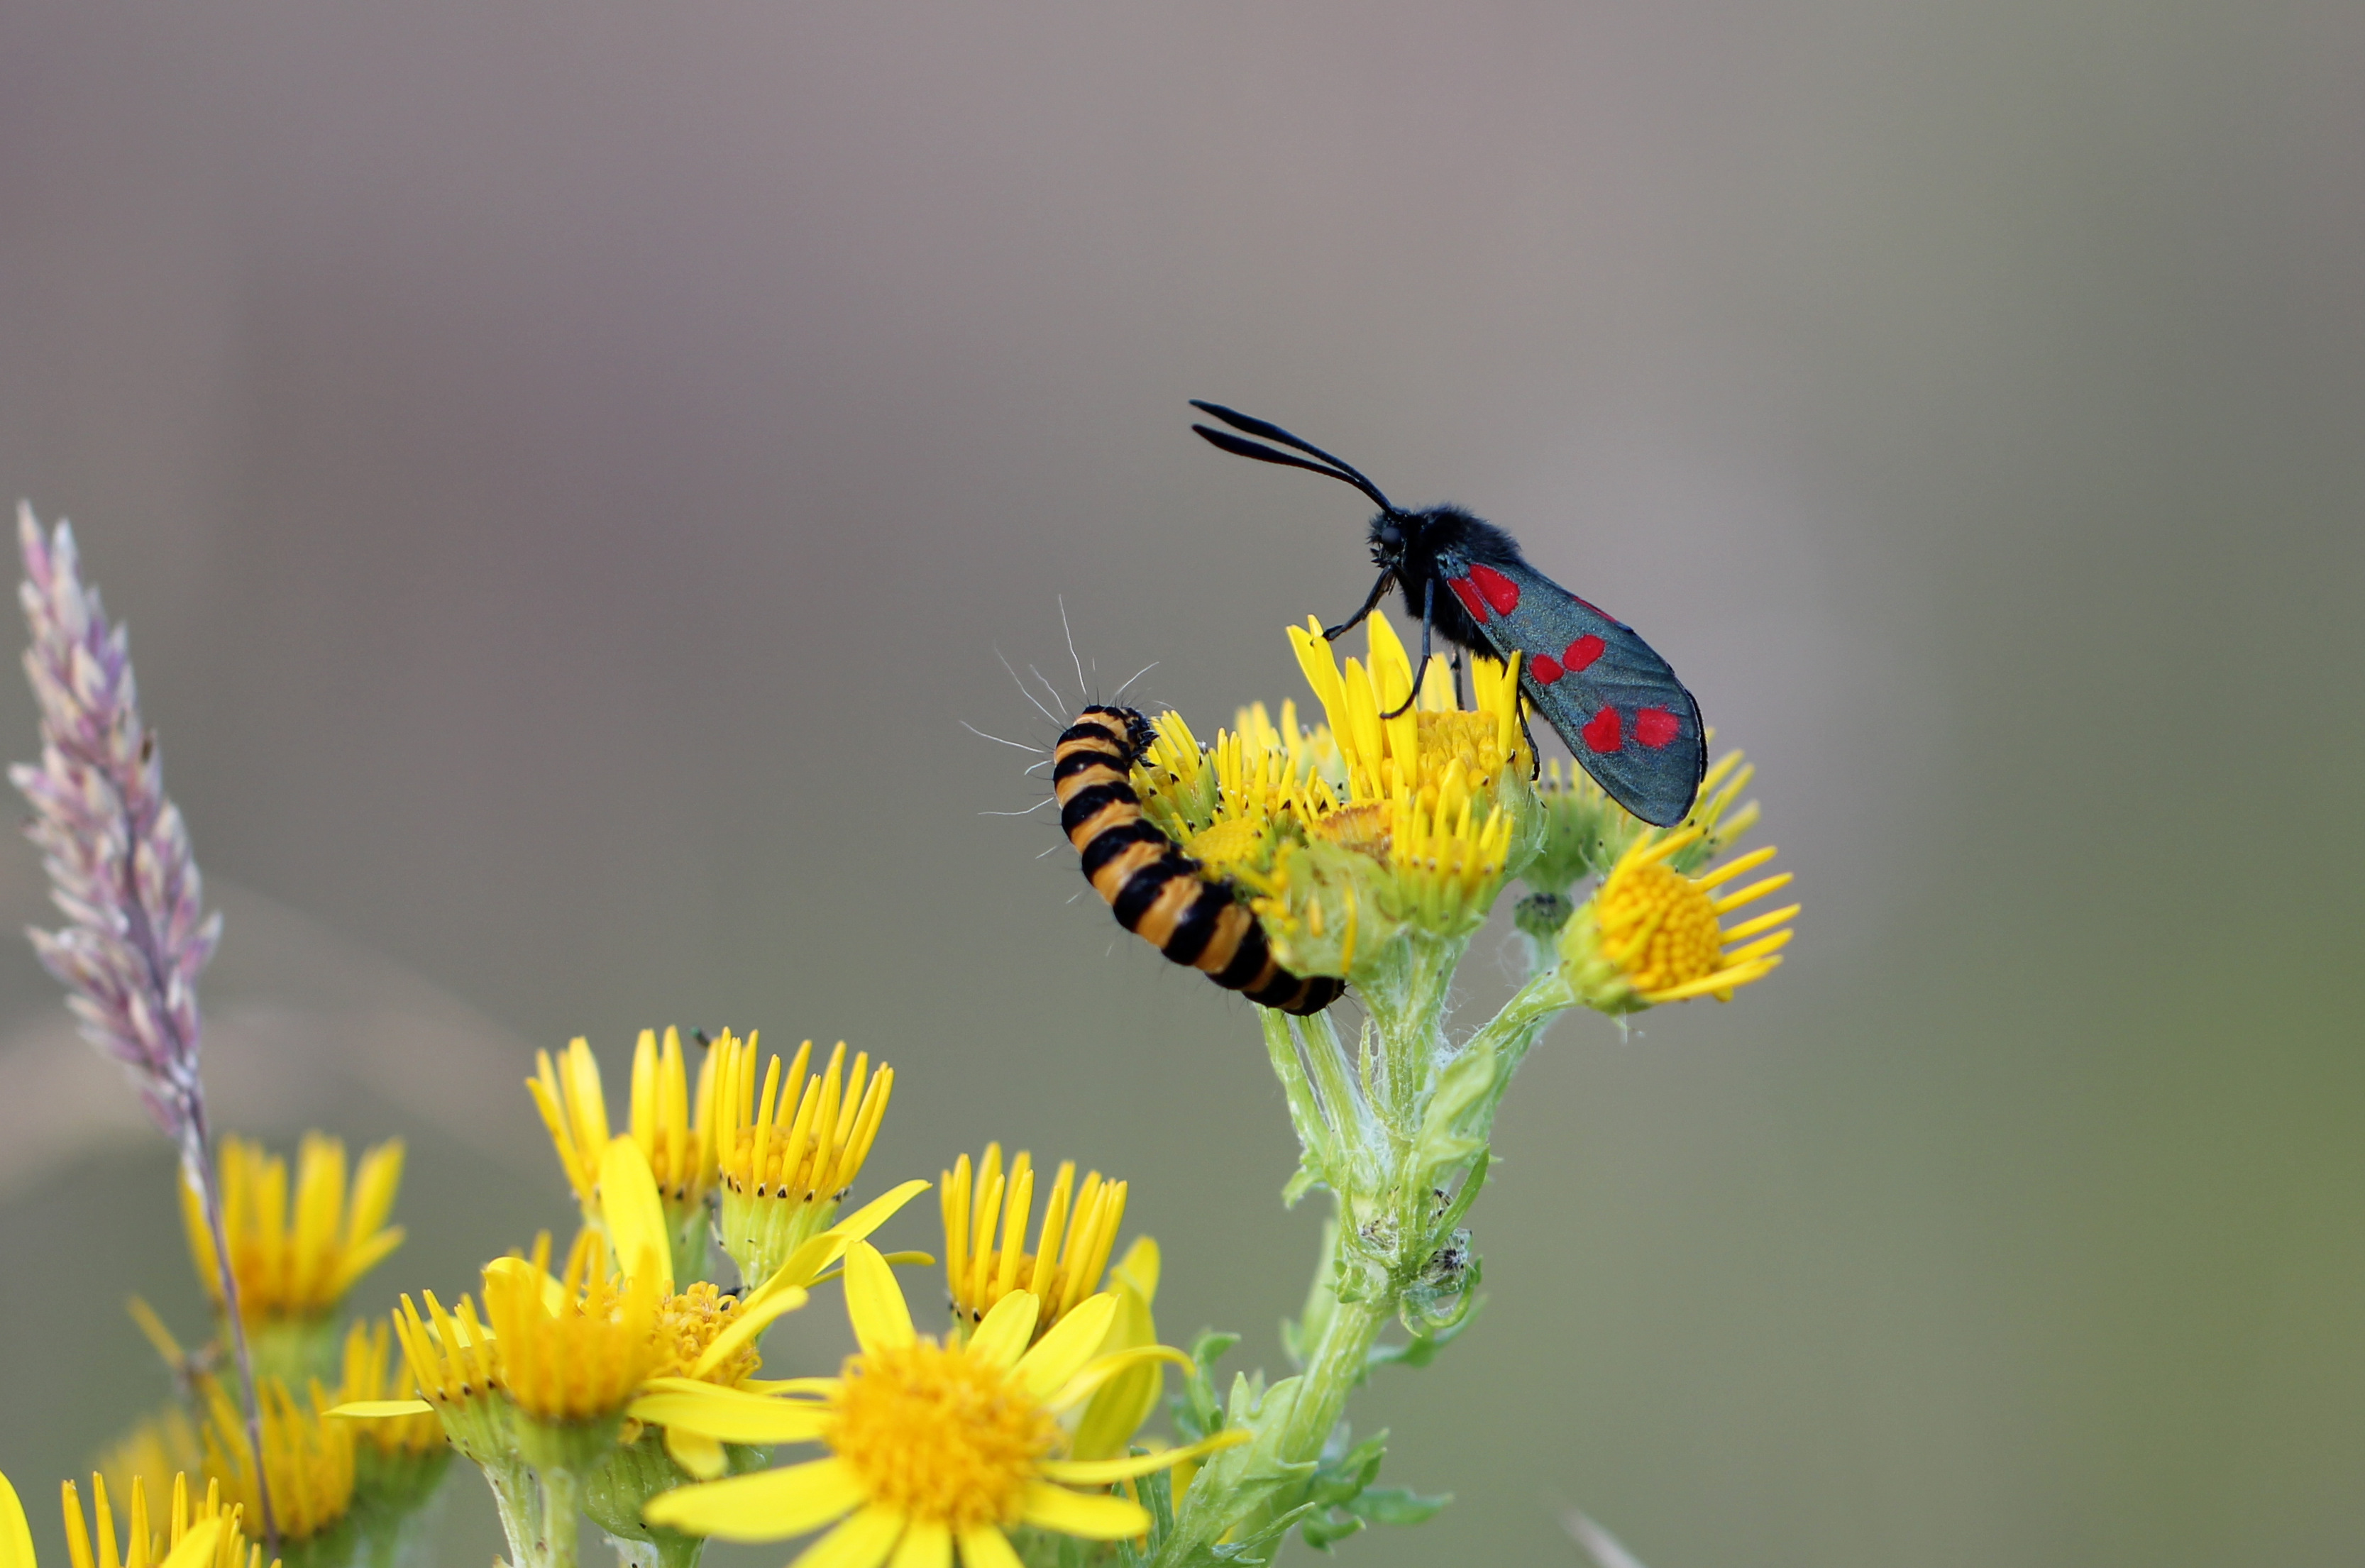 Una pareja de insectos - 3333x2210